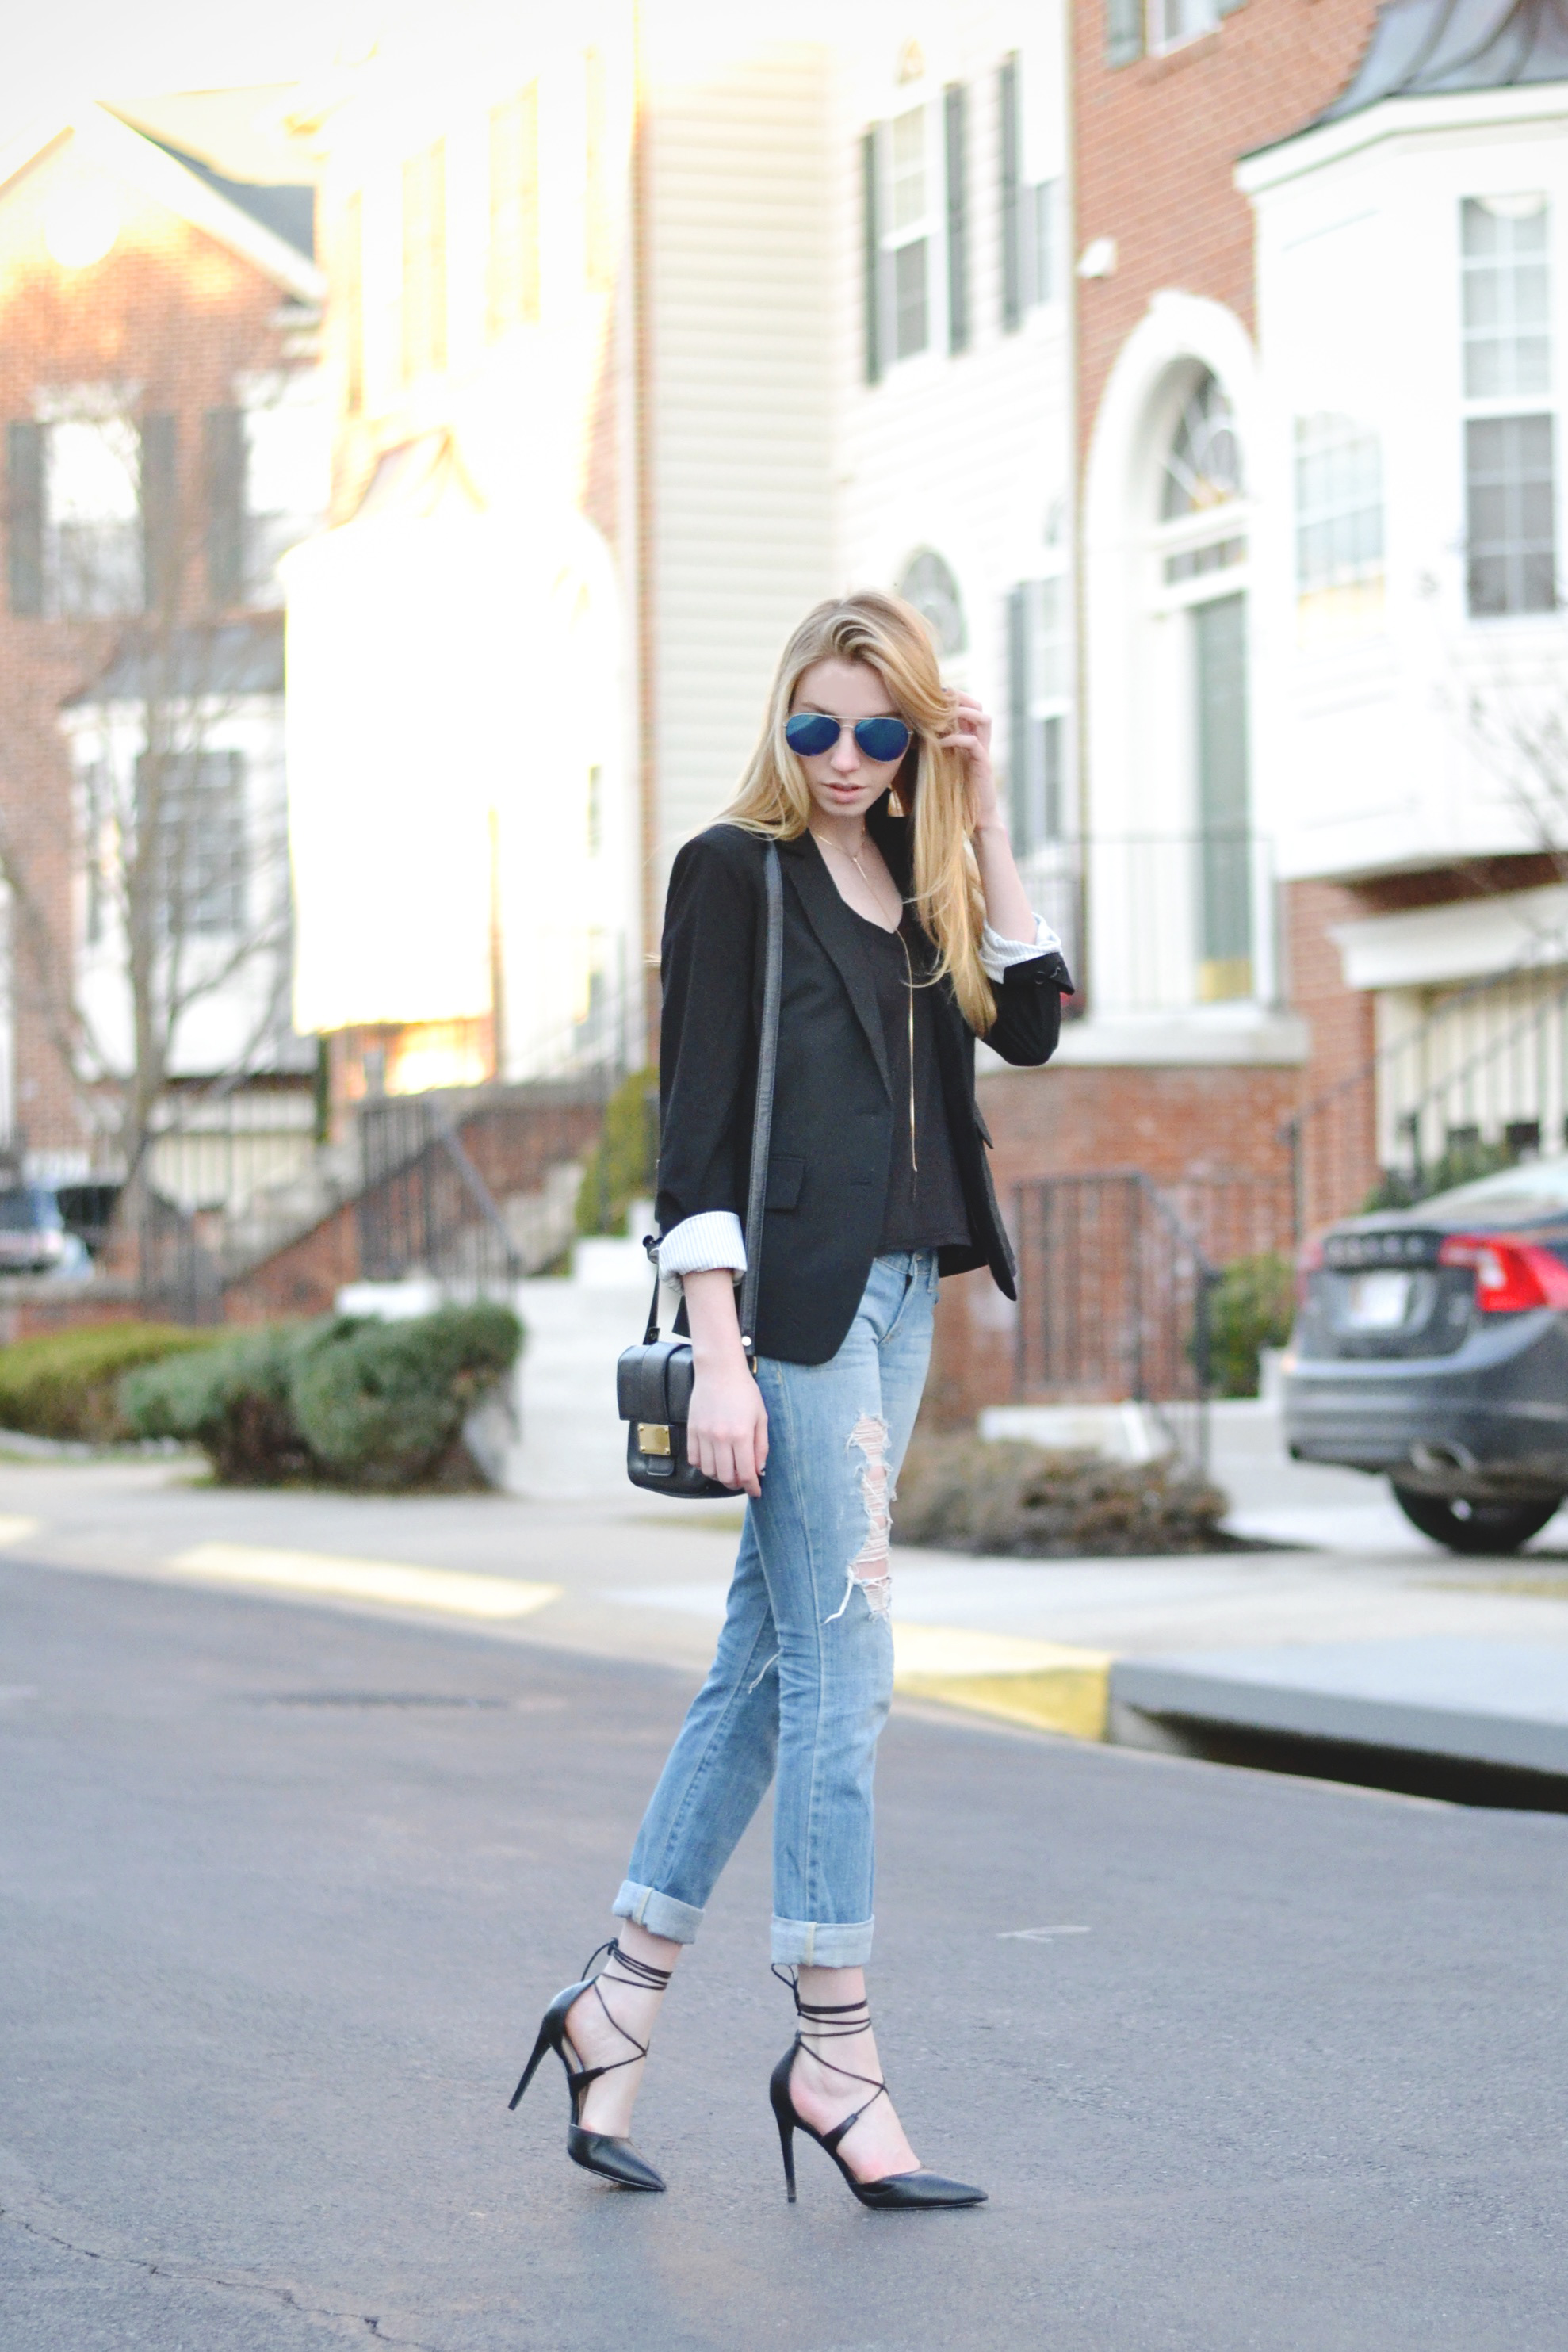 Black Blazer & Ripped Boyfriend Jeans (via Girl x Garment)